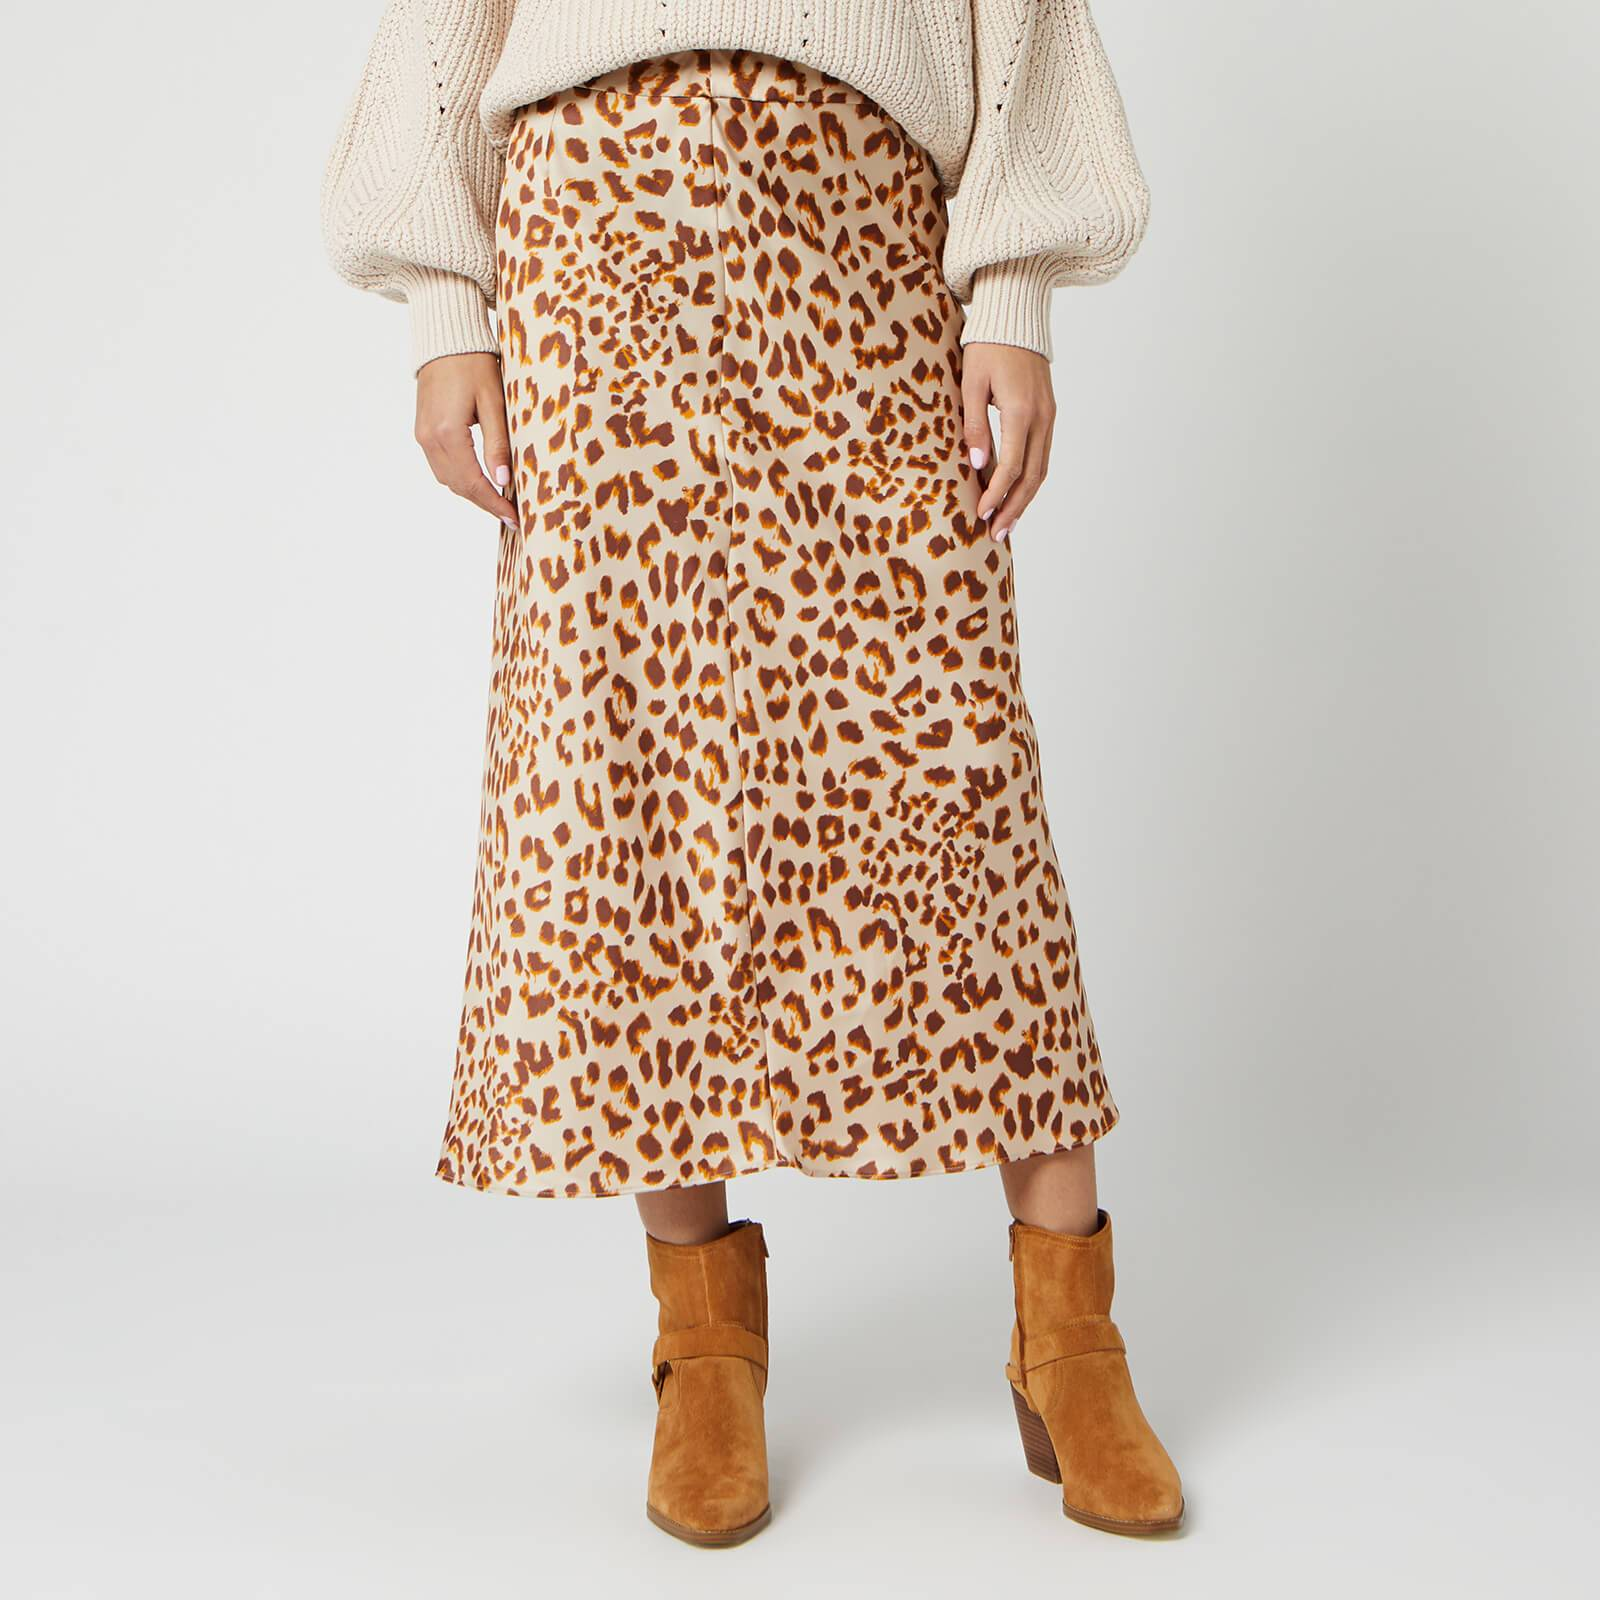 Free People Women's Normani Bias Skirt - Brown Leopard - US 4/UK 8